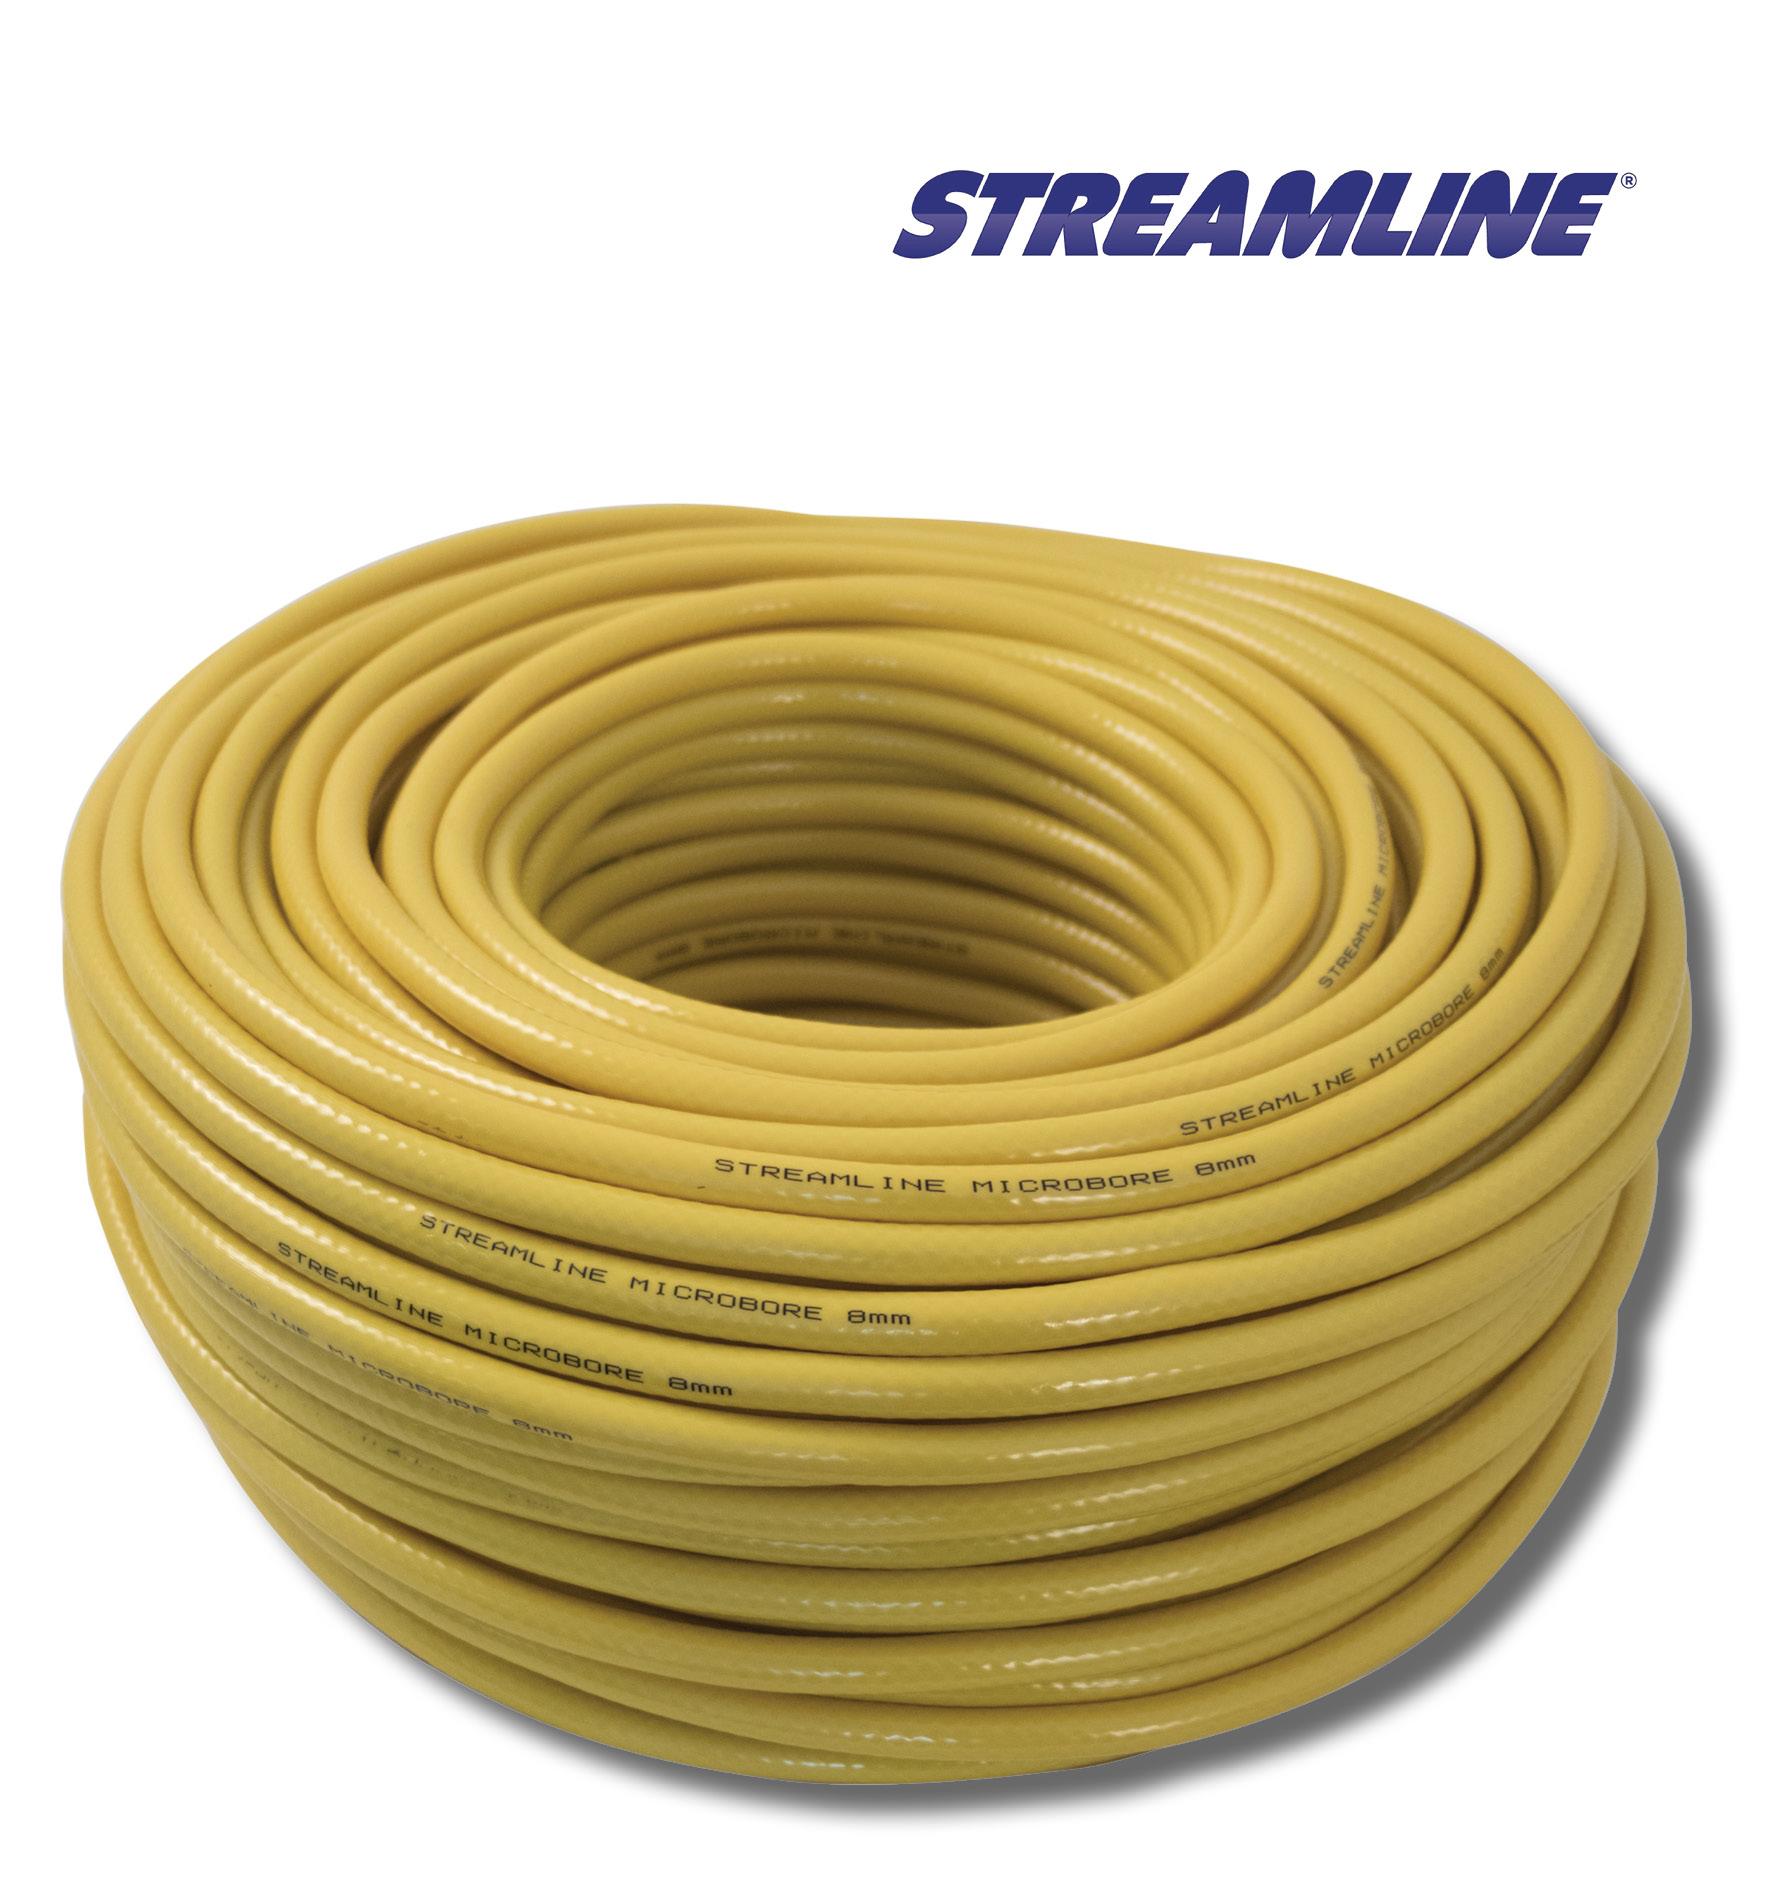 Streamline 8mm Minibore Hose Yellow 50 Metres